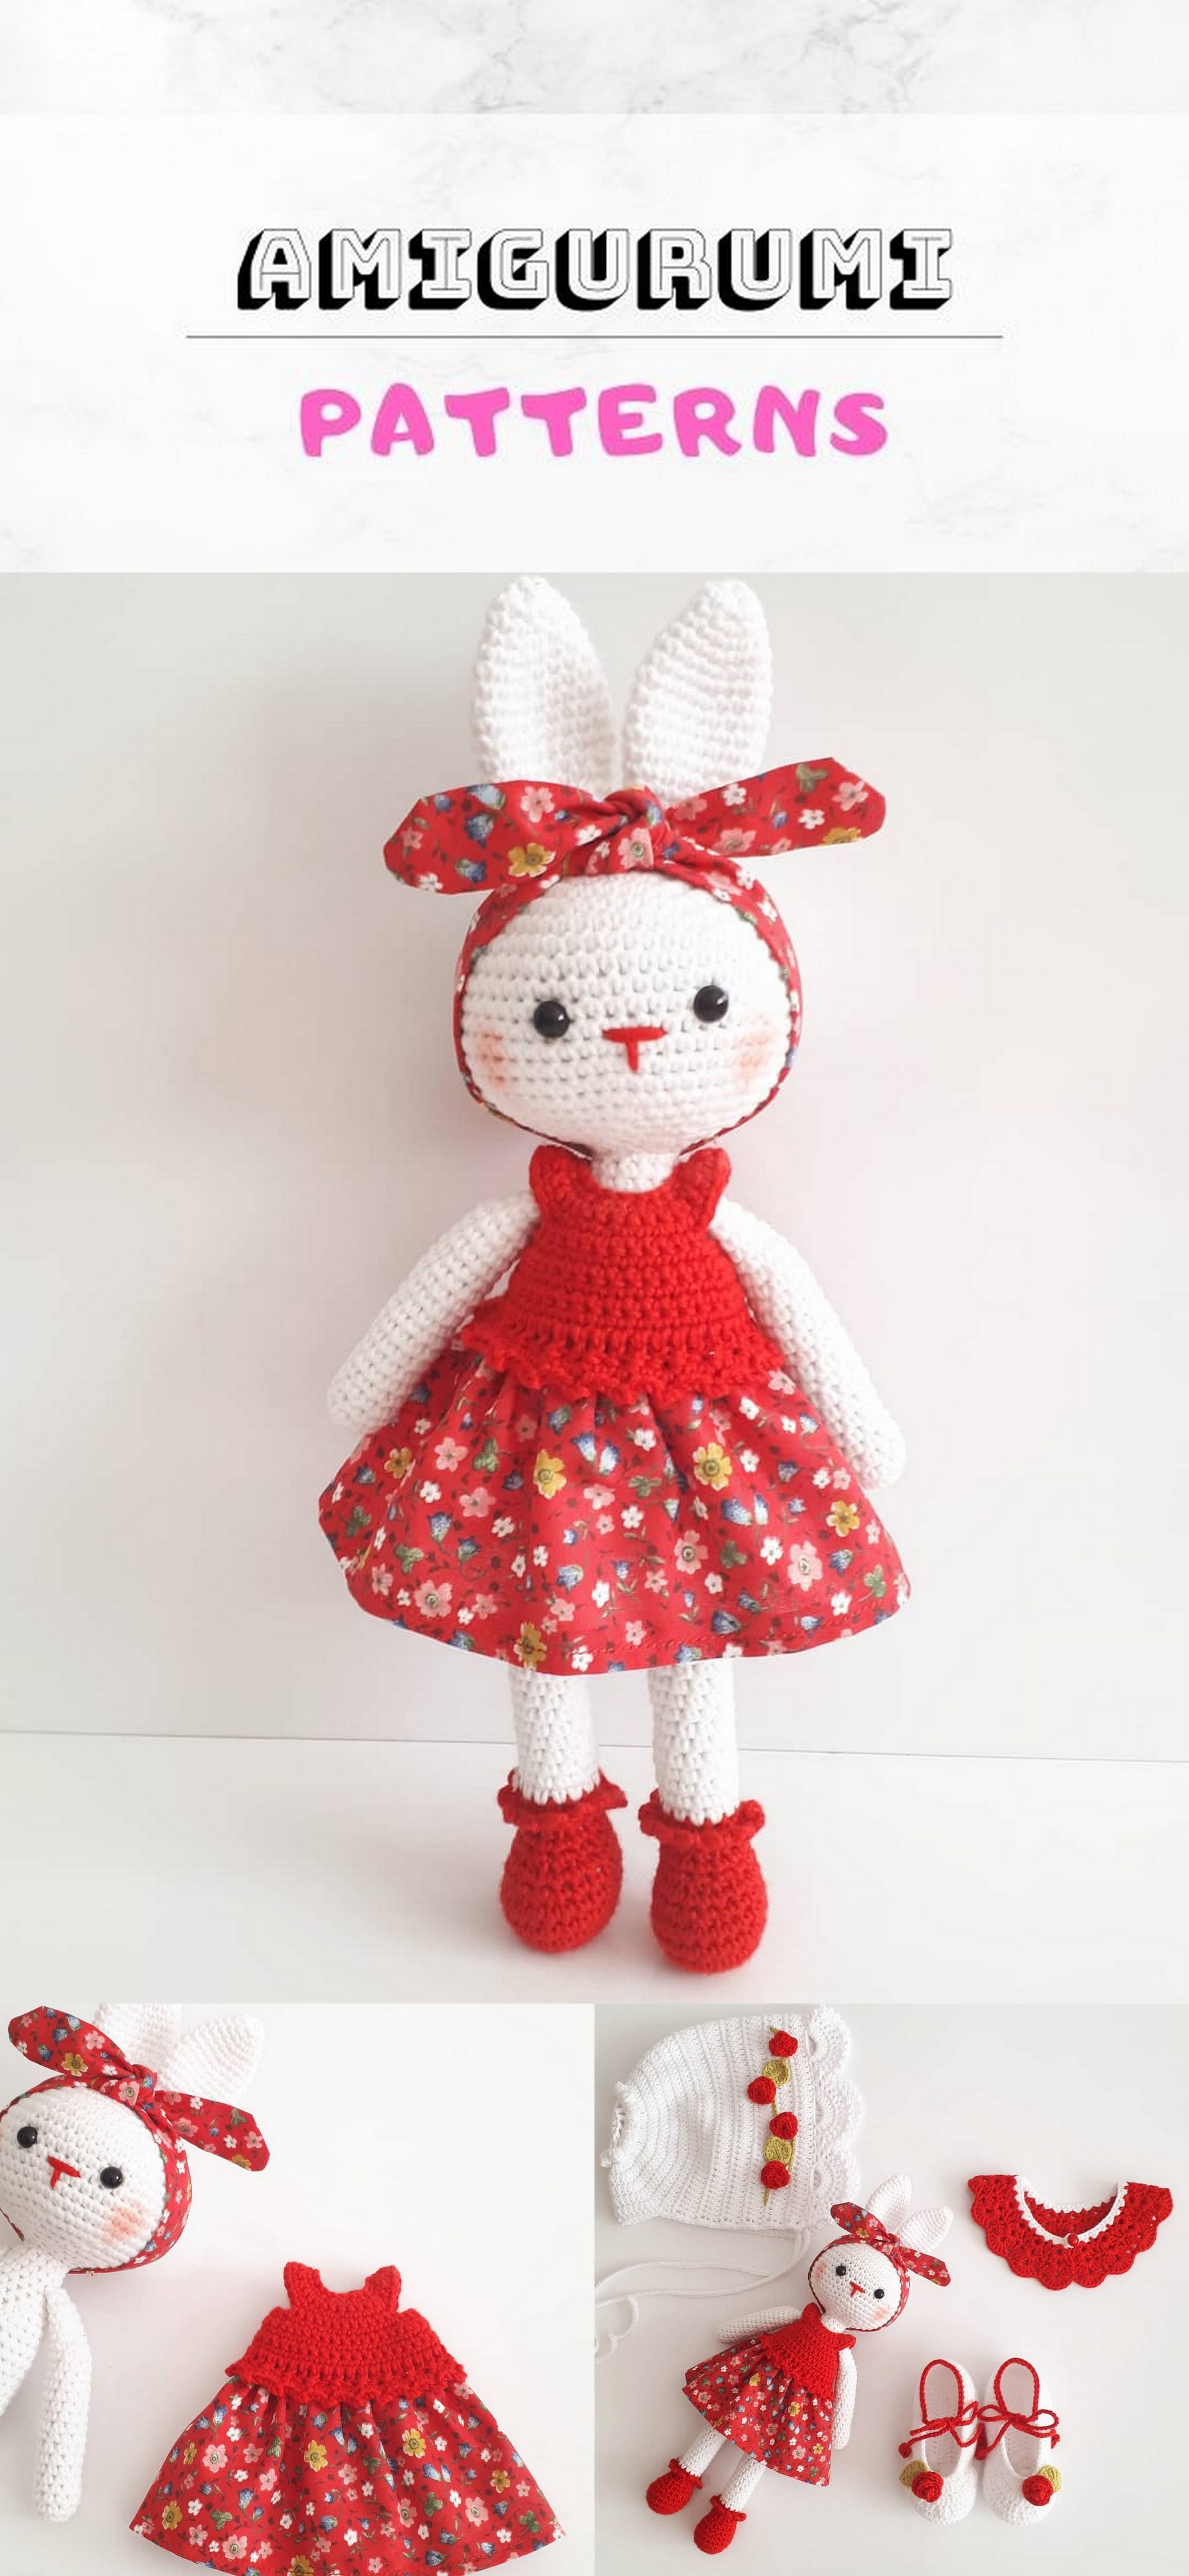 20+ Amigurumi Bunny Top Best Free Crochet Patterns